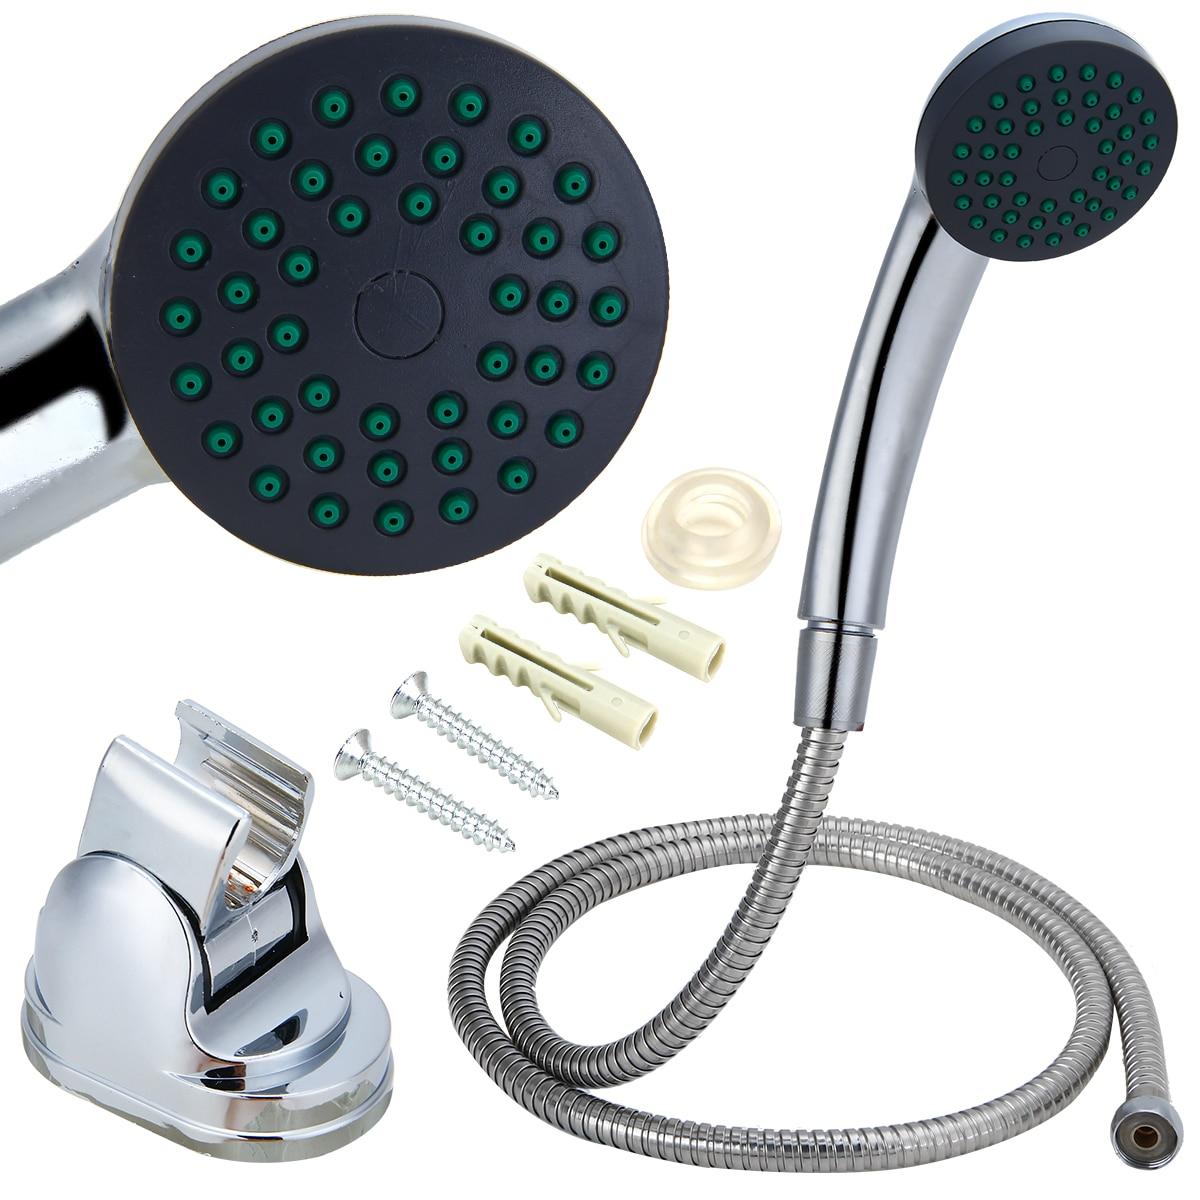 Us 7 99 30 Off Mayitr 3pcs Bathroom Shower Head Set Handheld Spray Shower Head Bracket Flexible Horse For Bath Shower Accessories In Shower